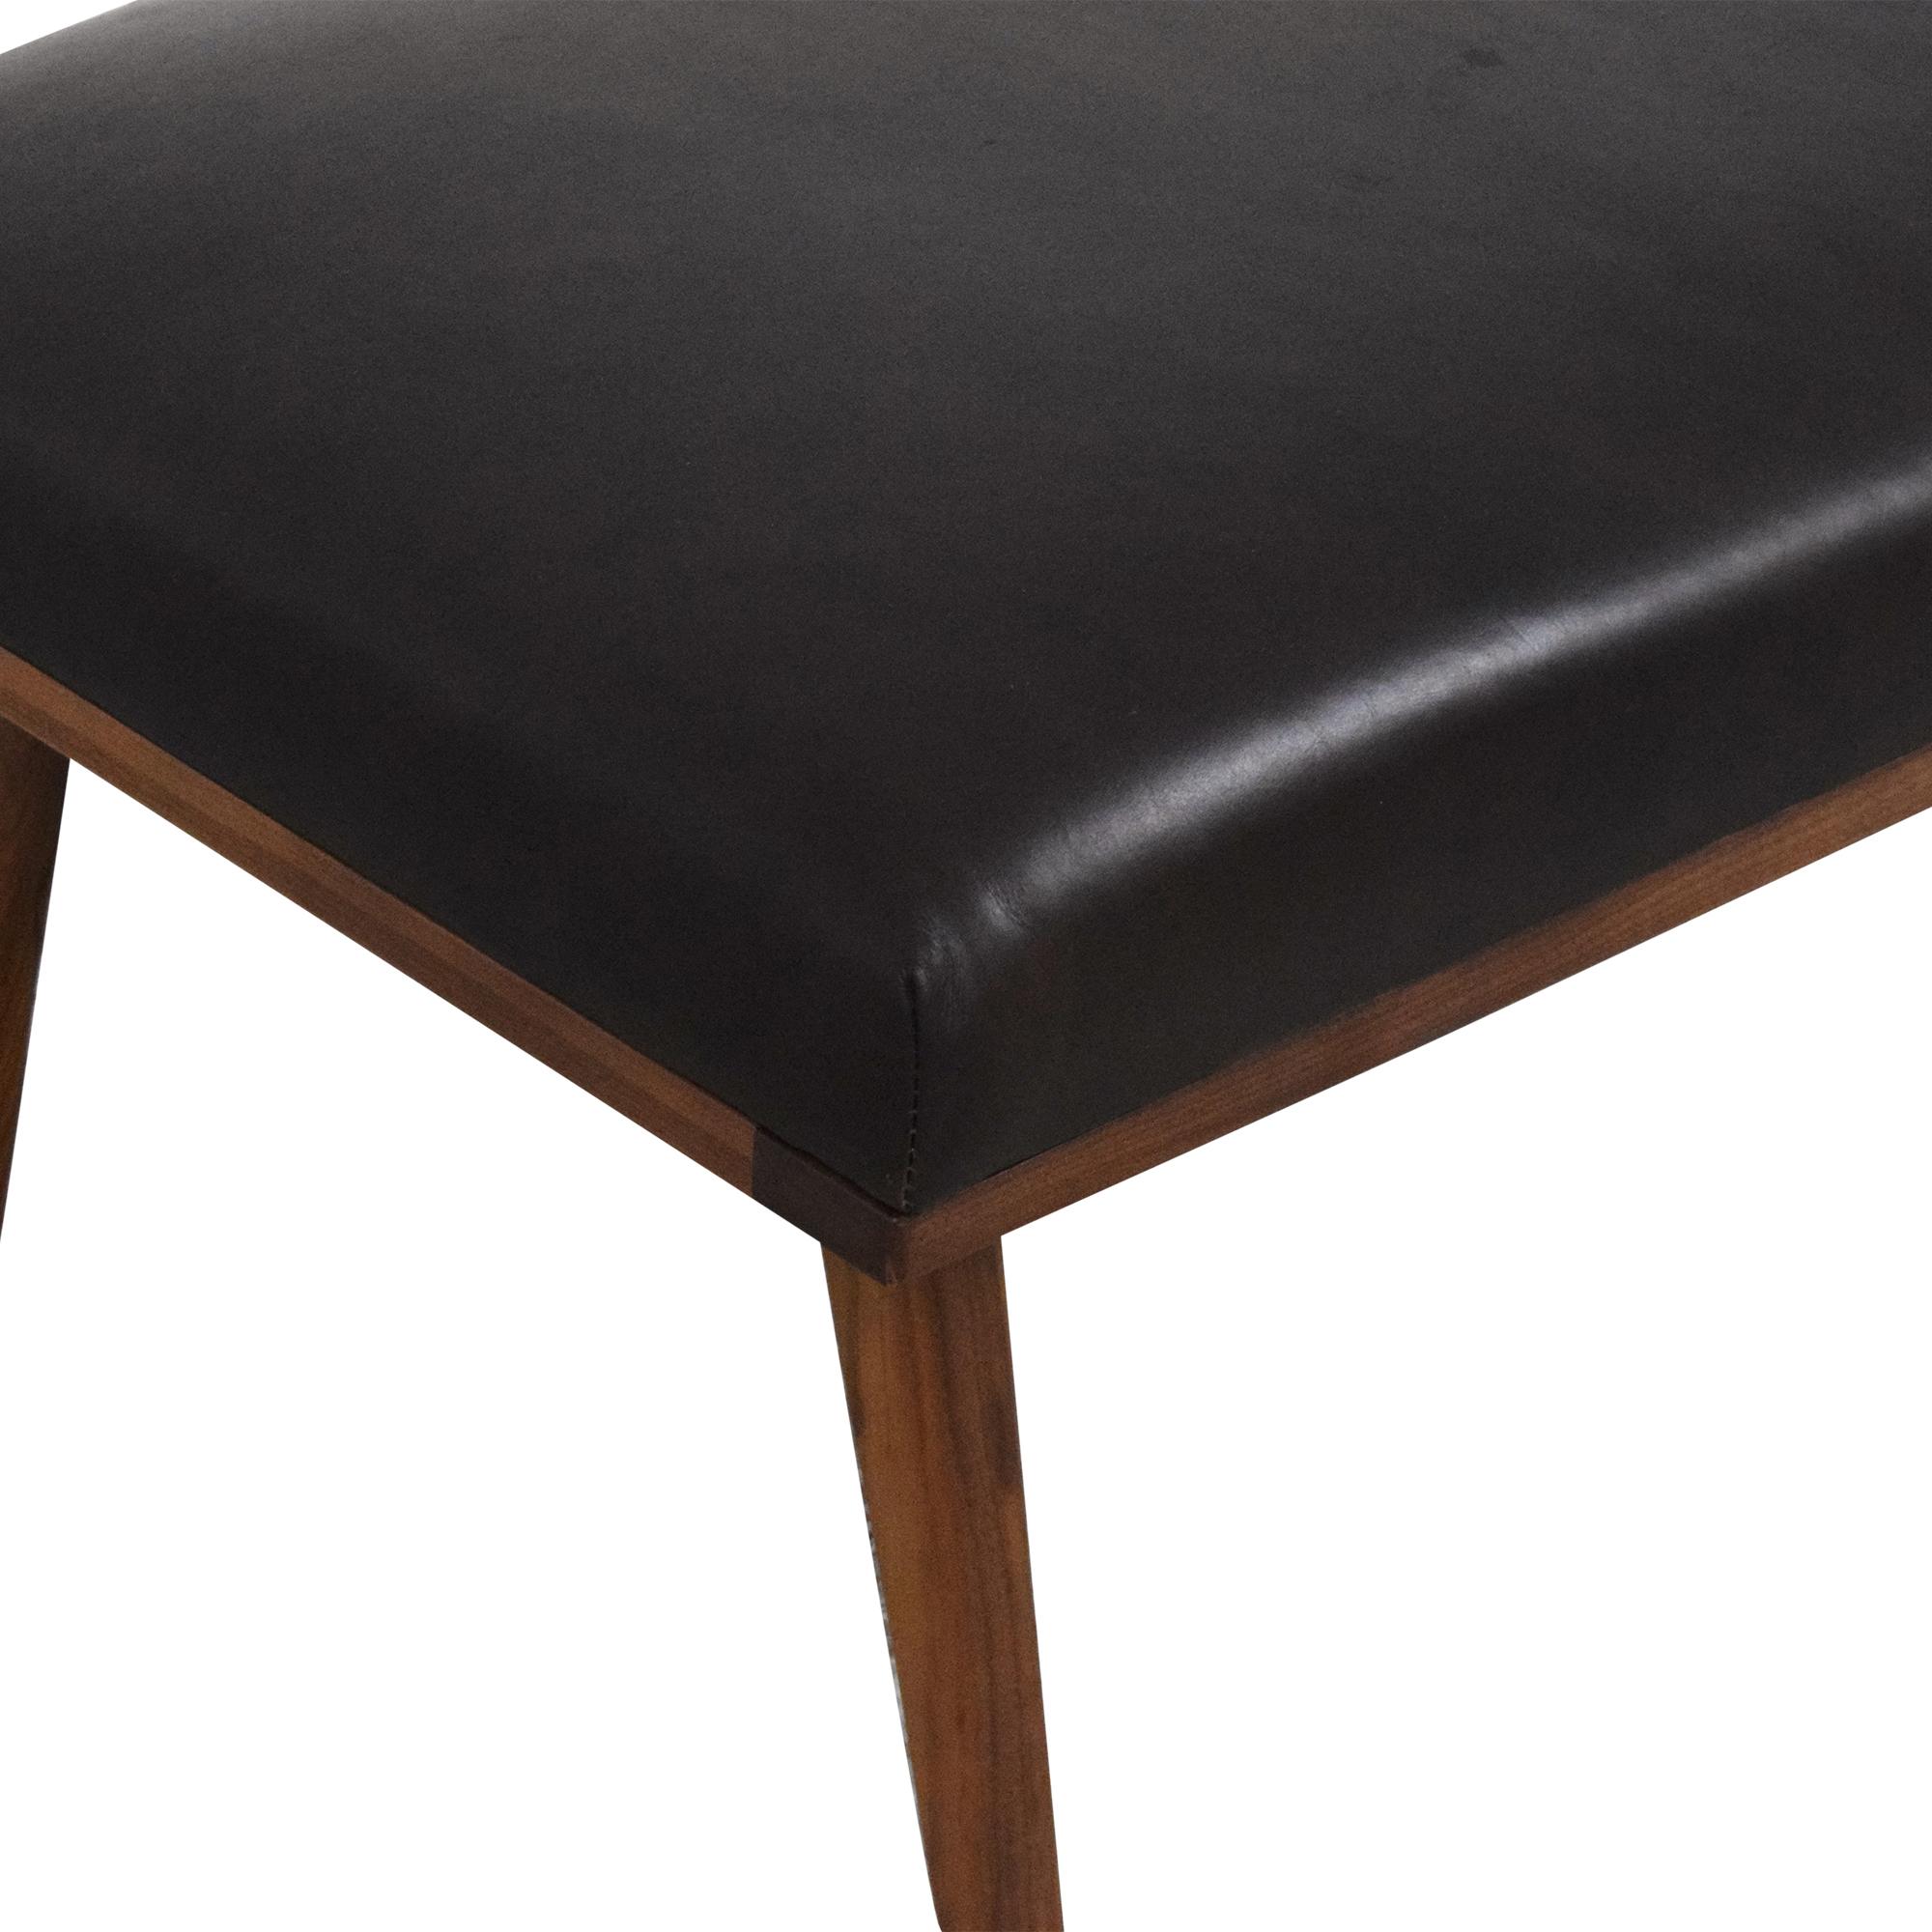 shop Crate & Barrel Crate & Barrel Cavett Upholstered Bench online